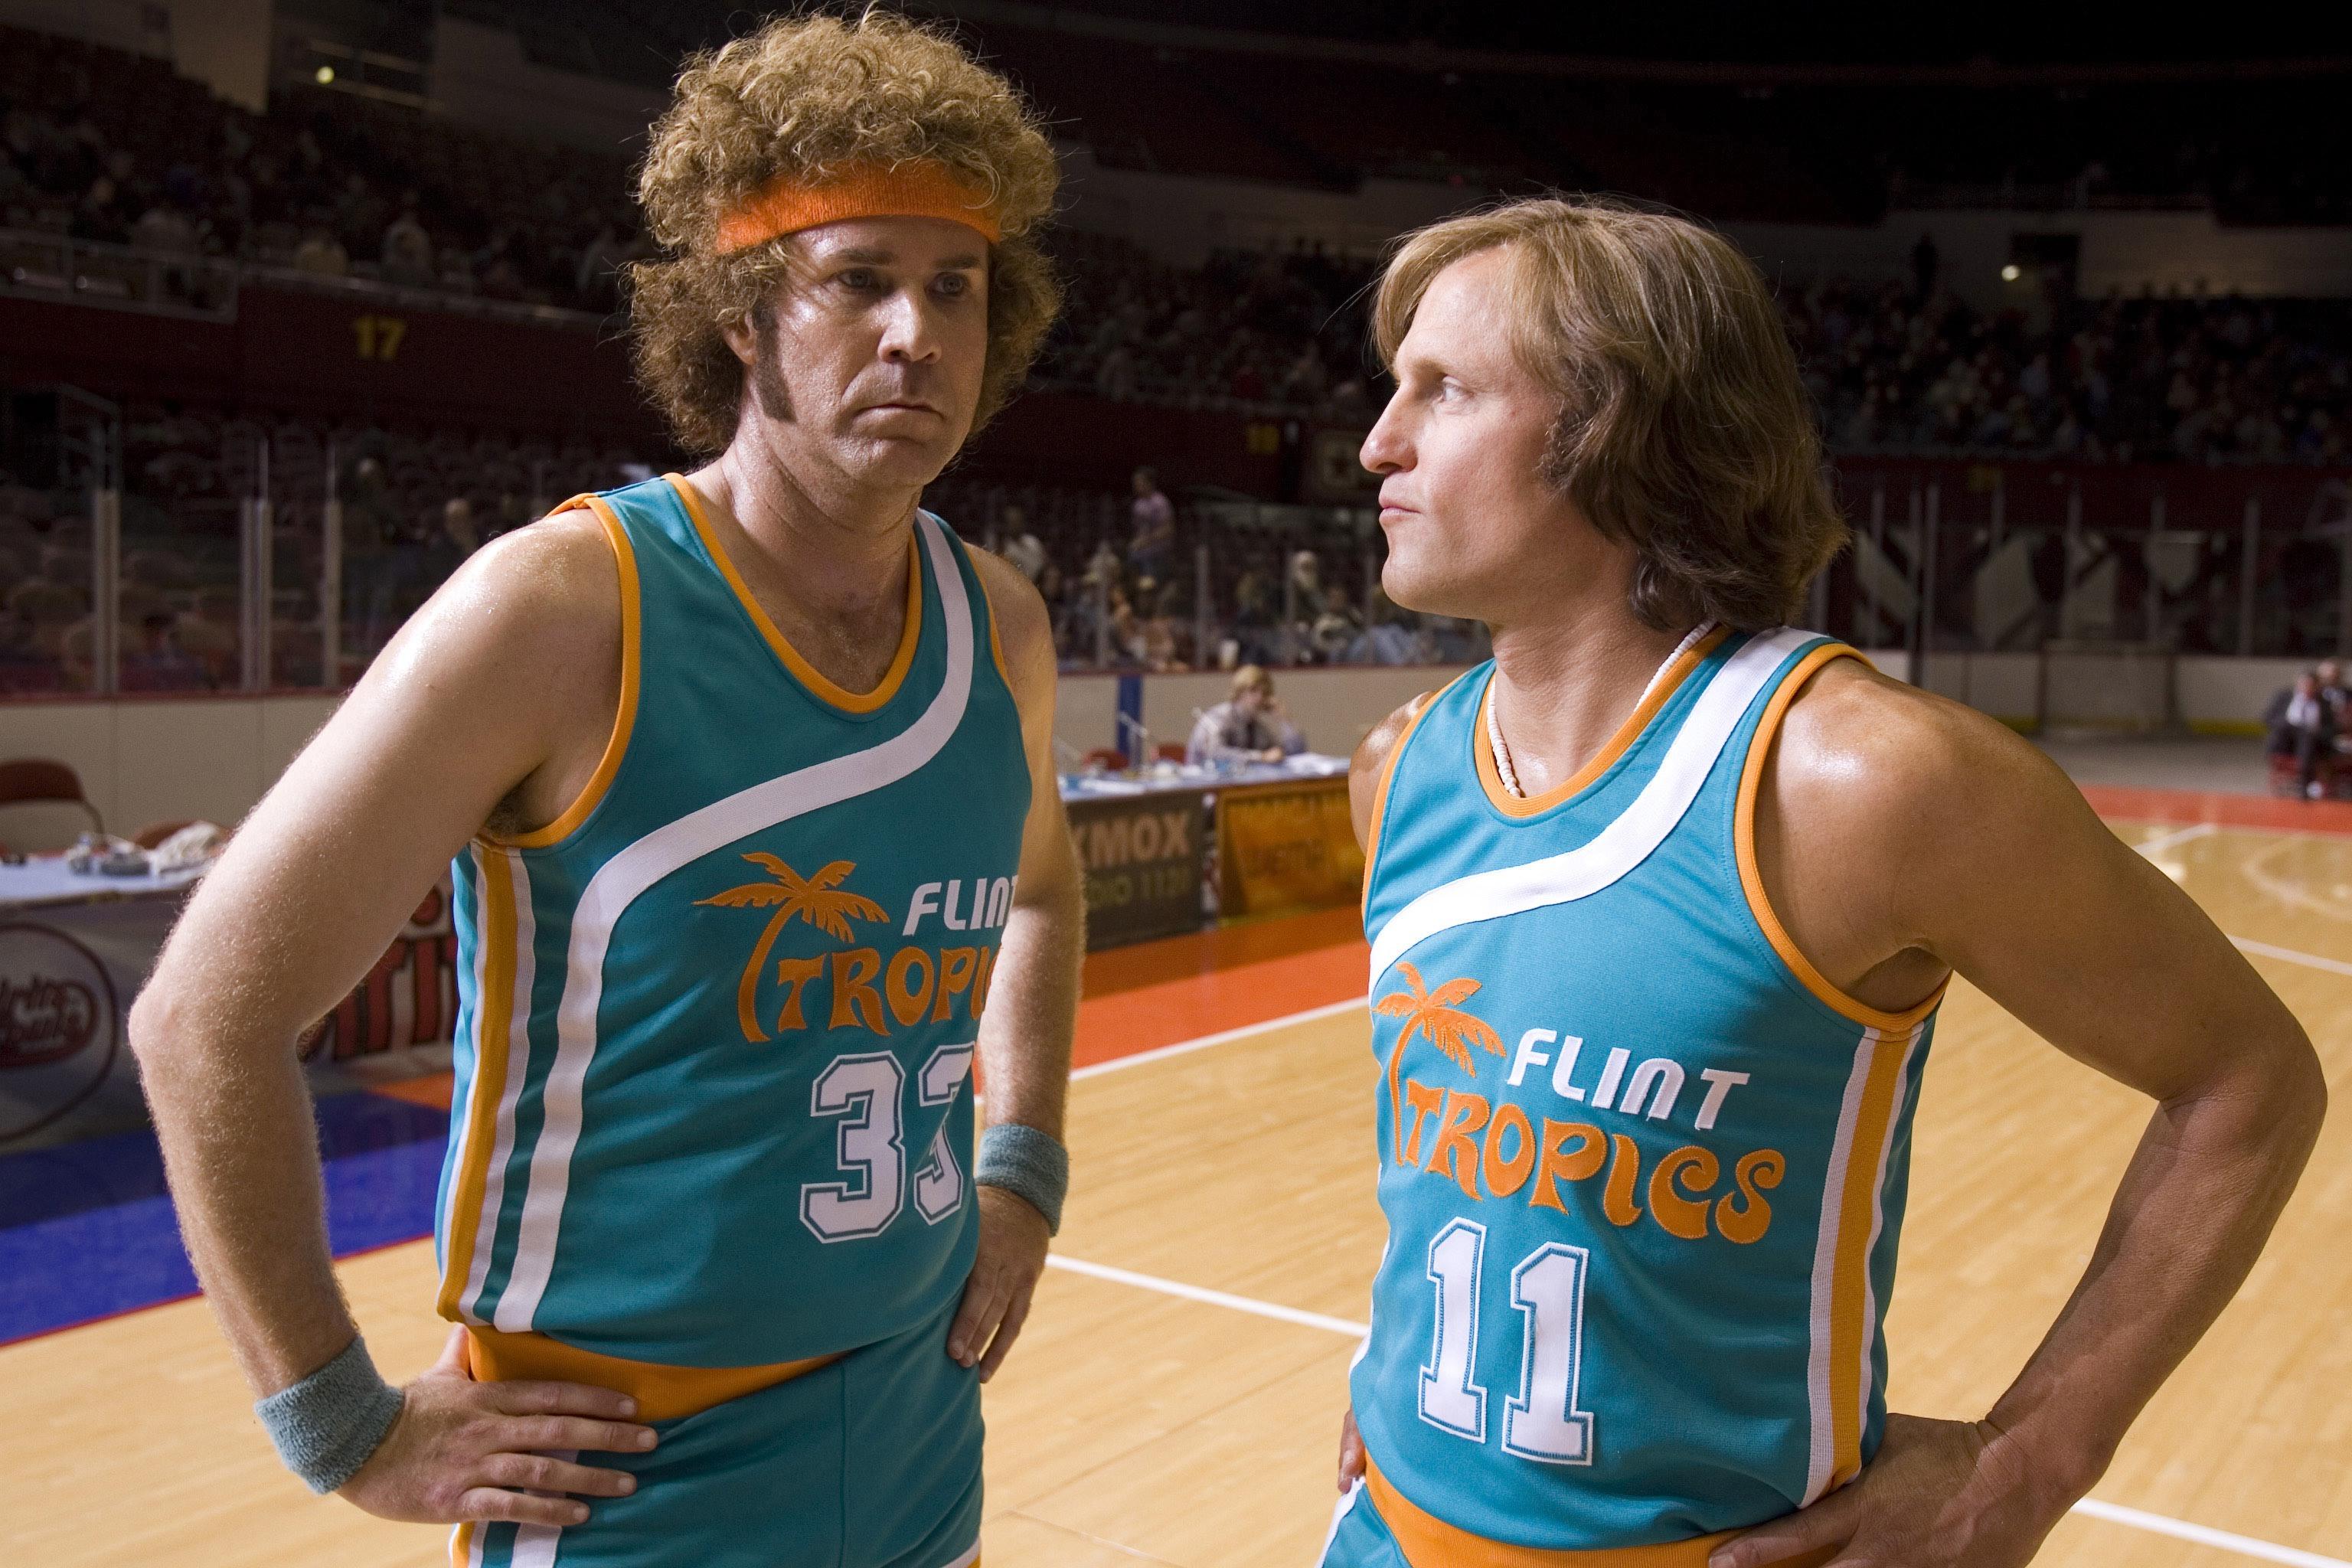 Will Ferrell, Woody Harrelson, Semi Pro